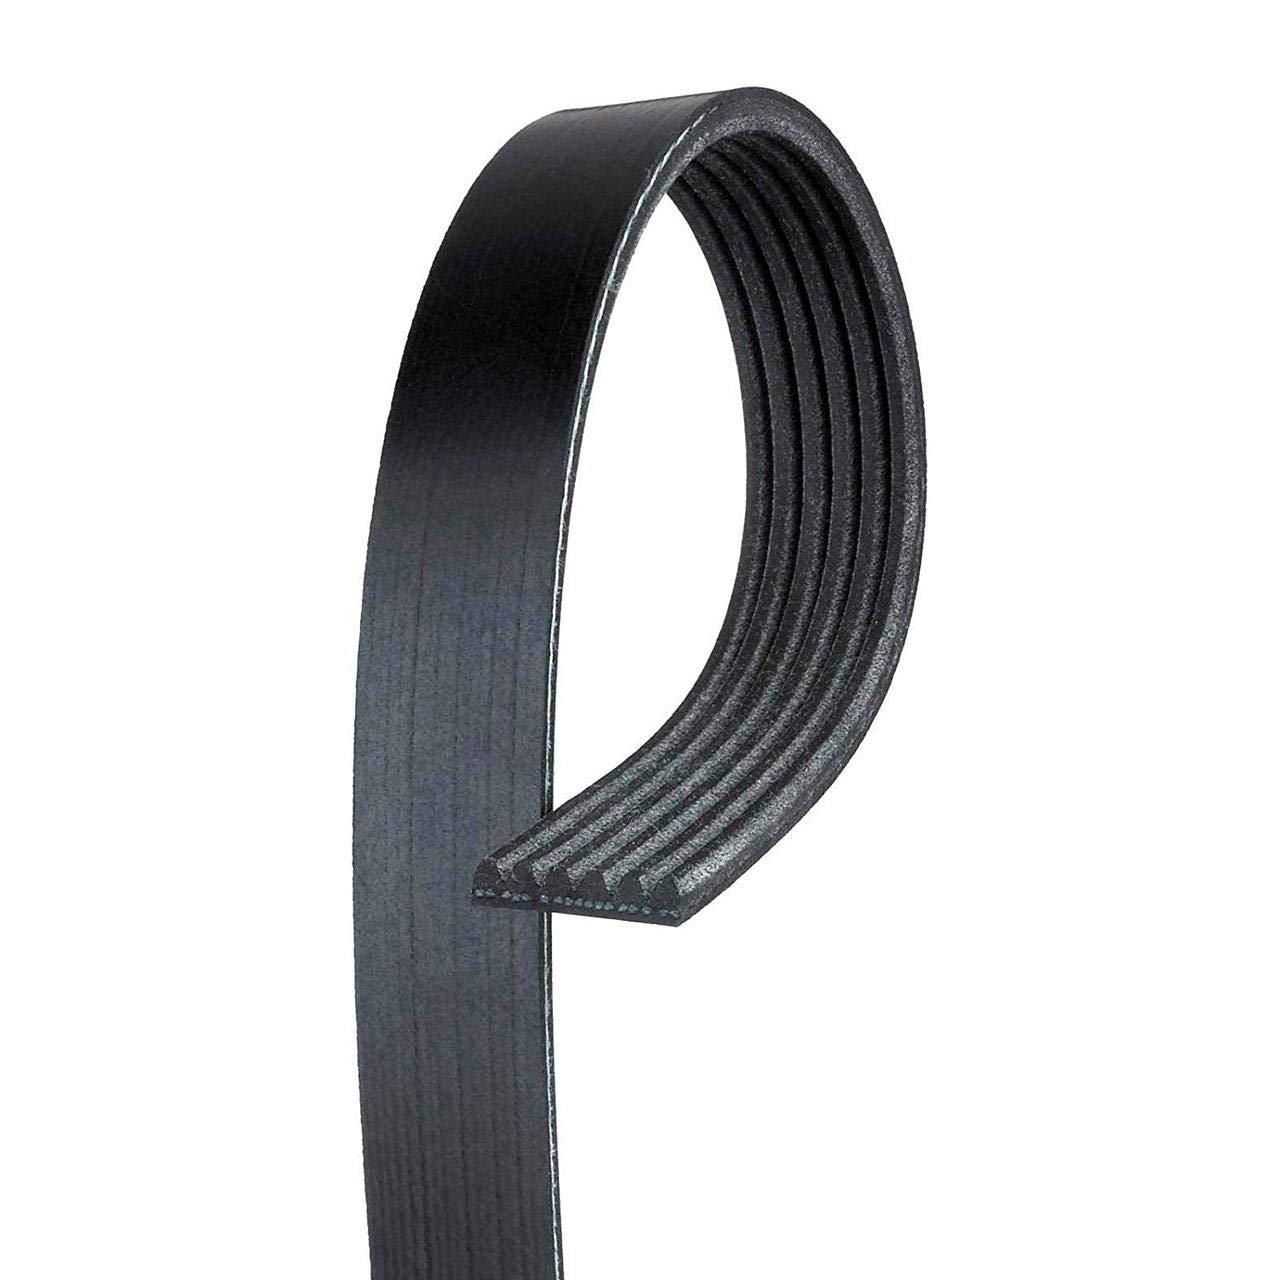 K061373 Premium Automotive V-Ribbed Belt